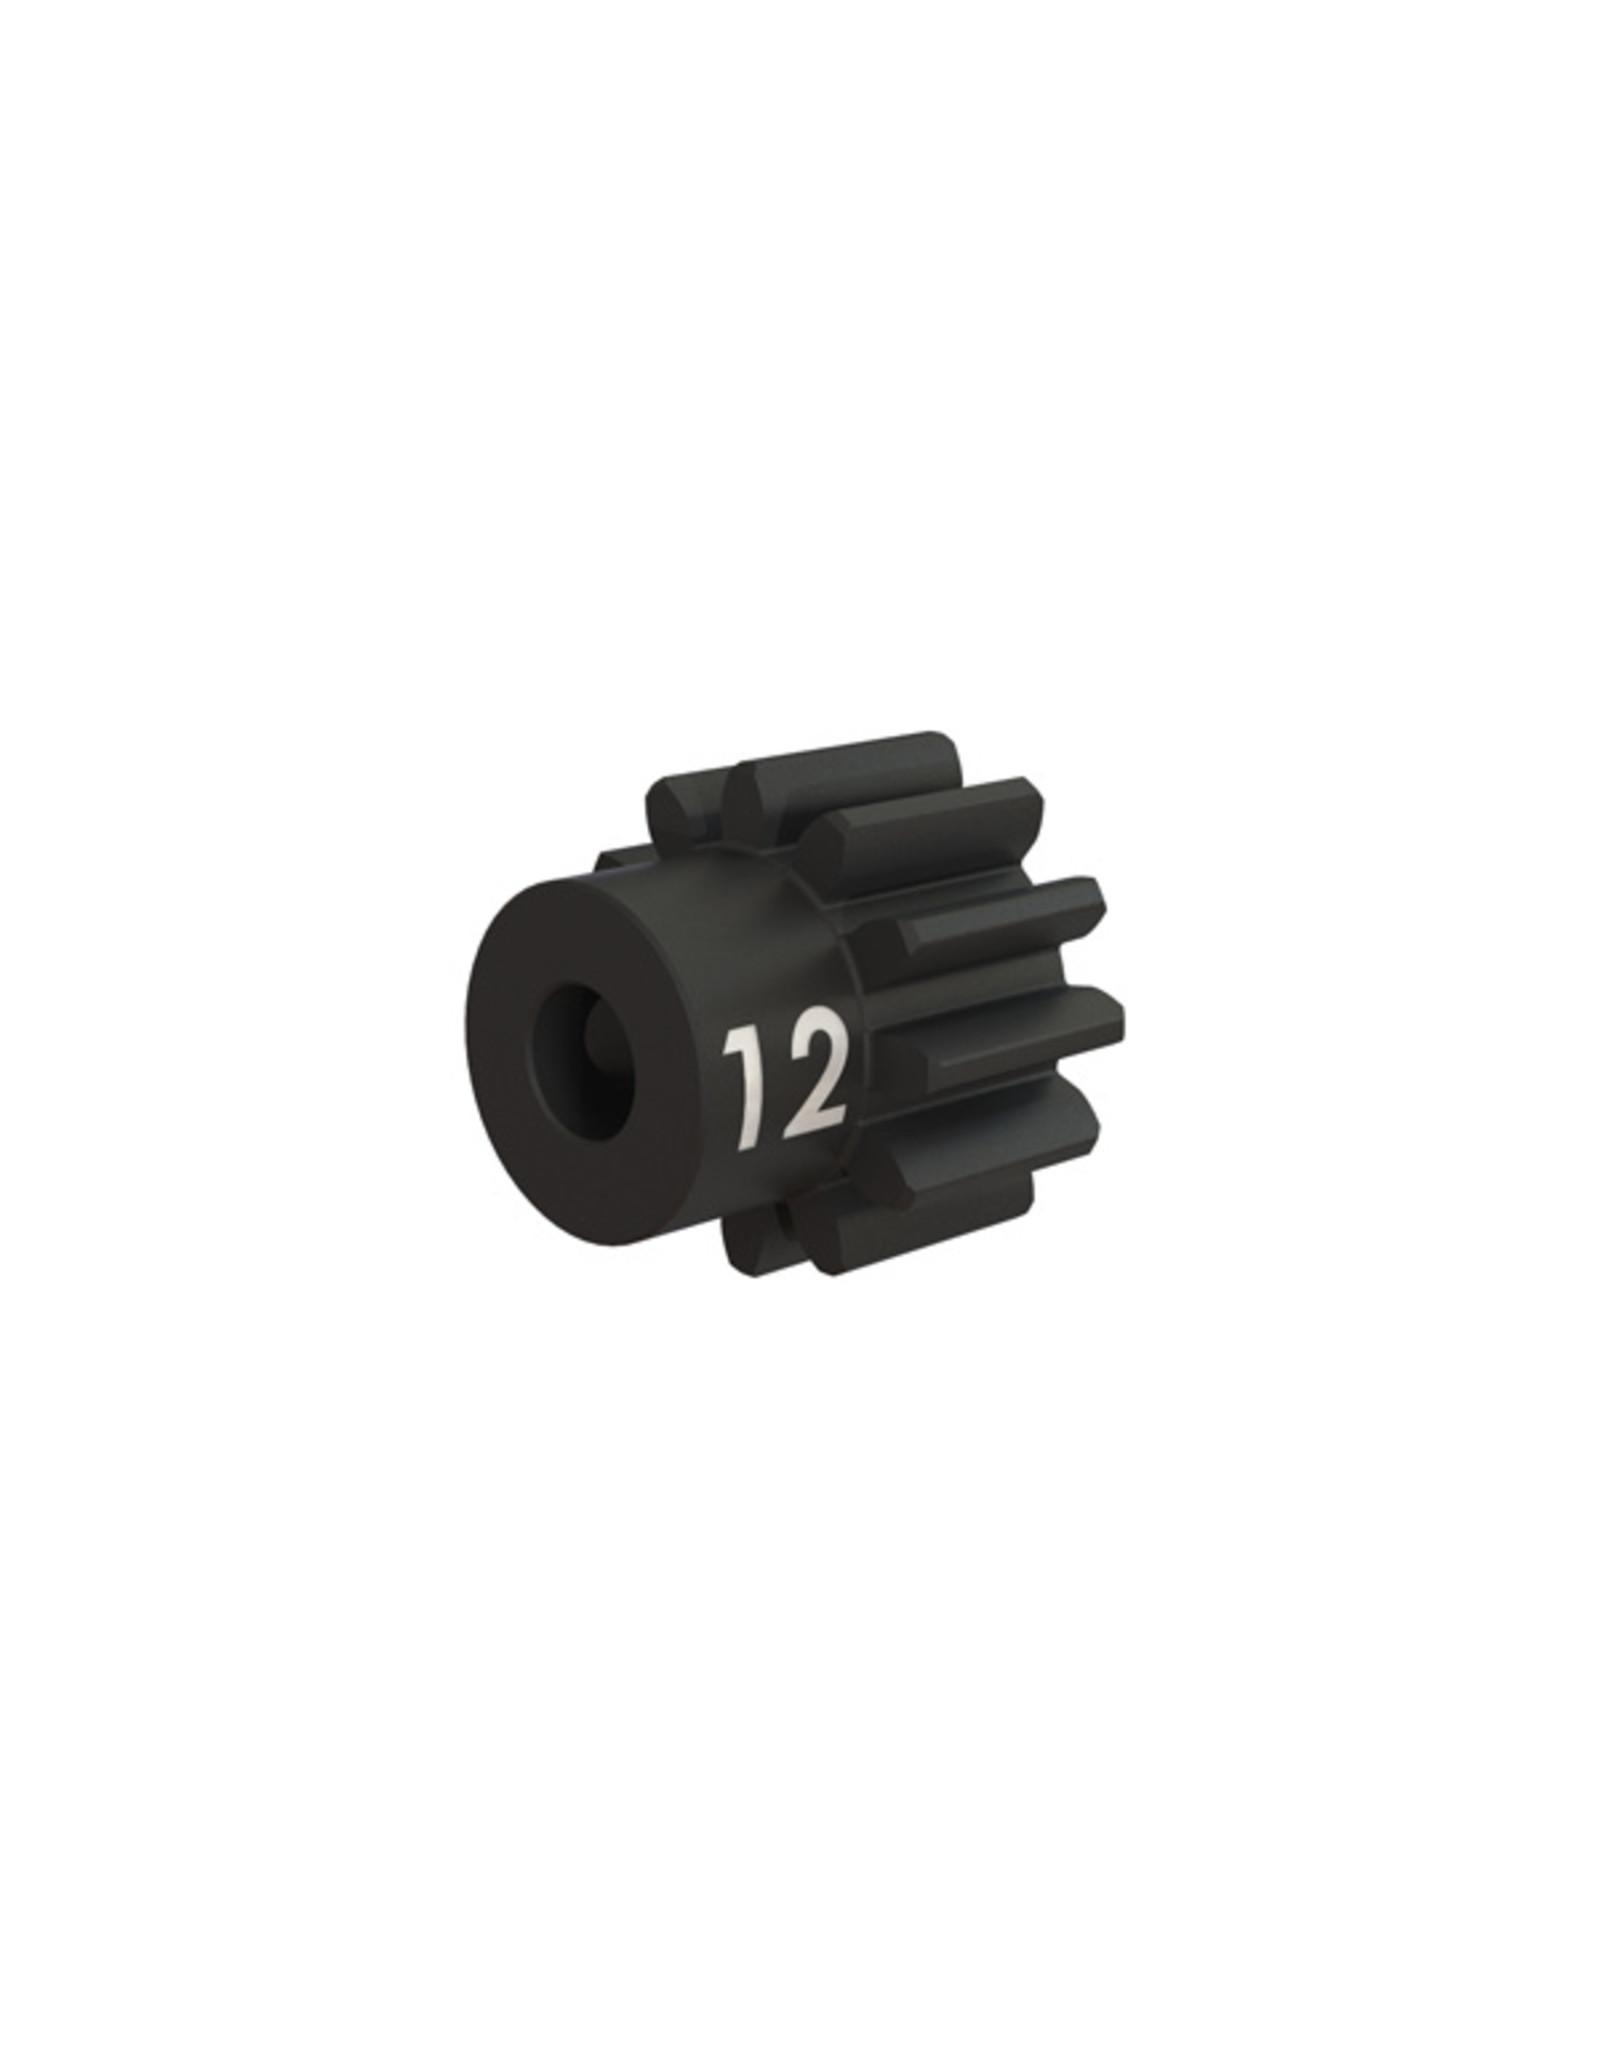 Traxxas 3942X - Heavy Duty Pinion Gear, 12T 32P